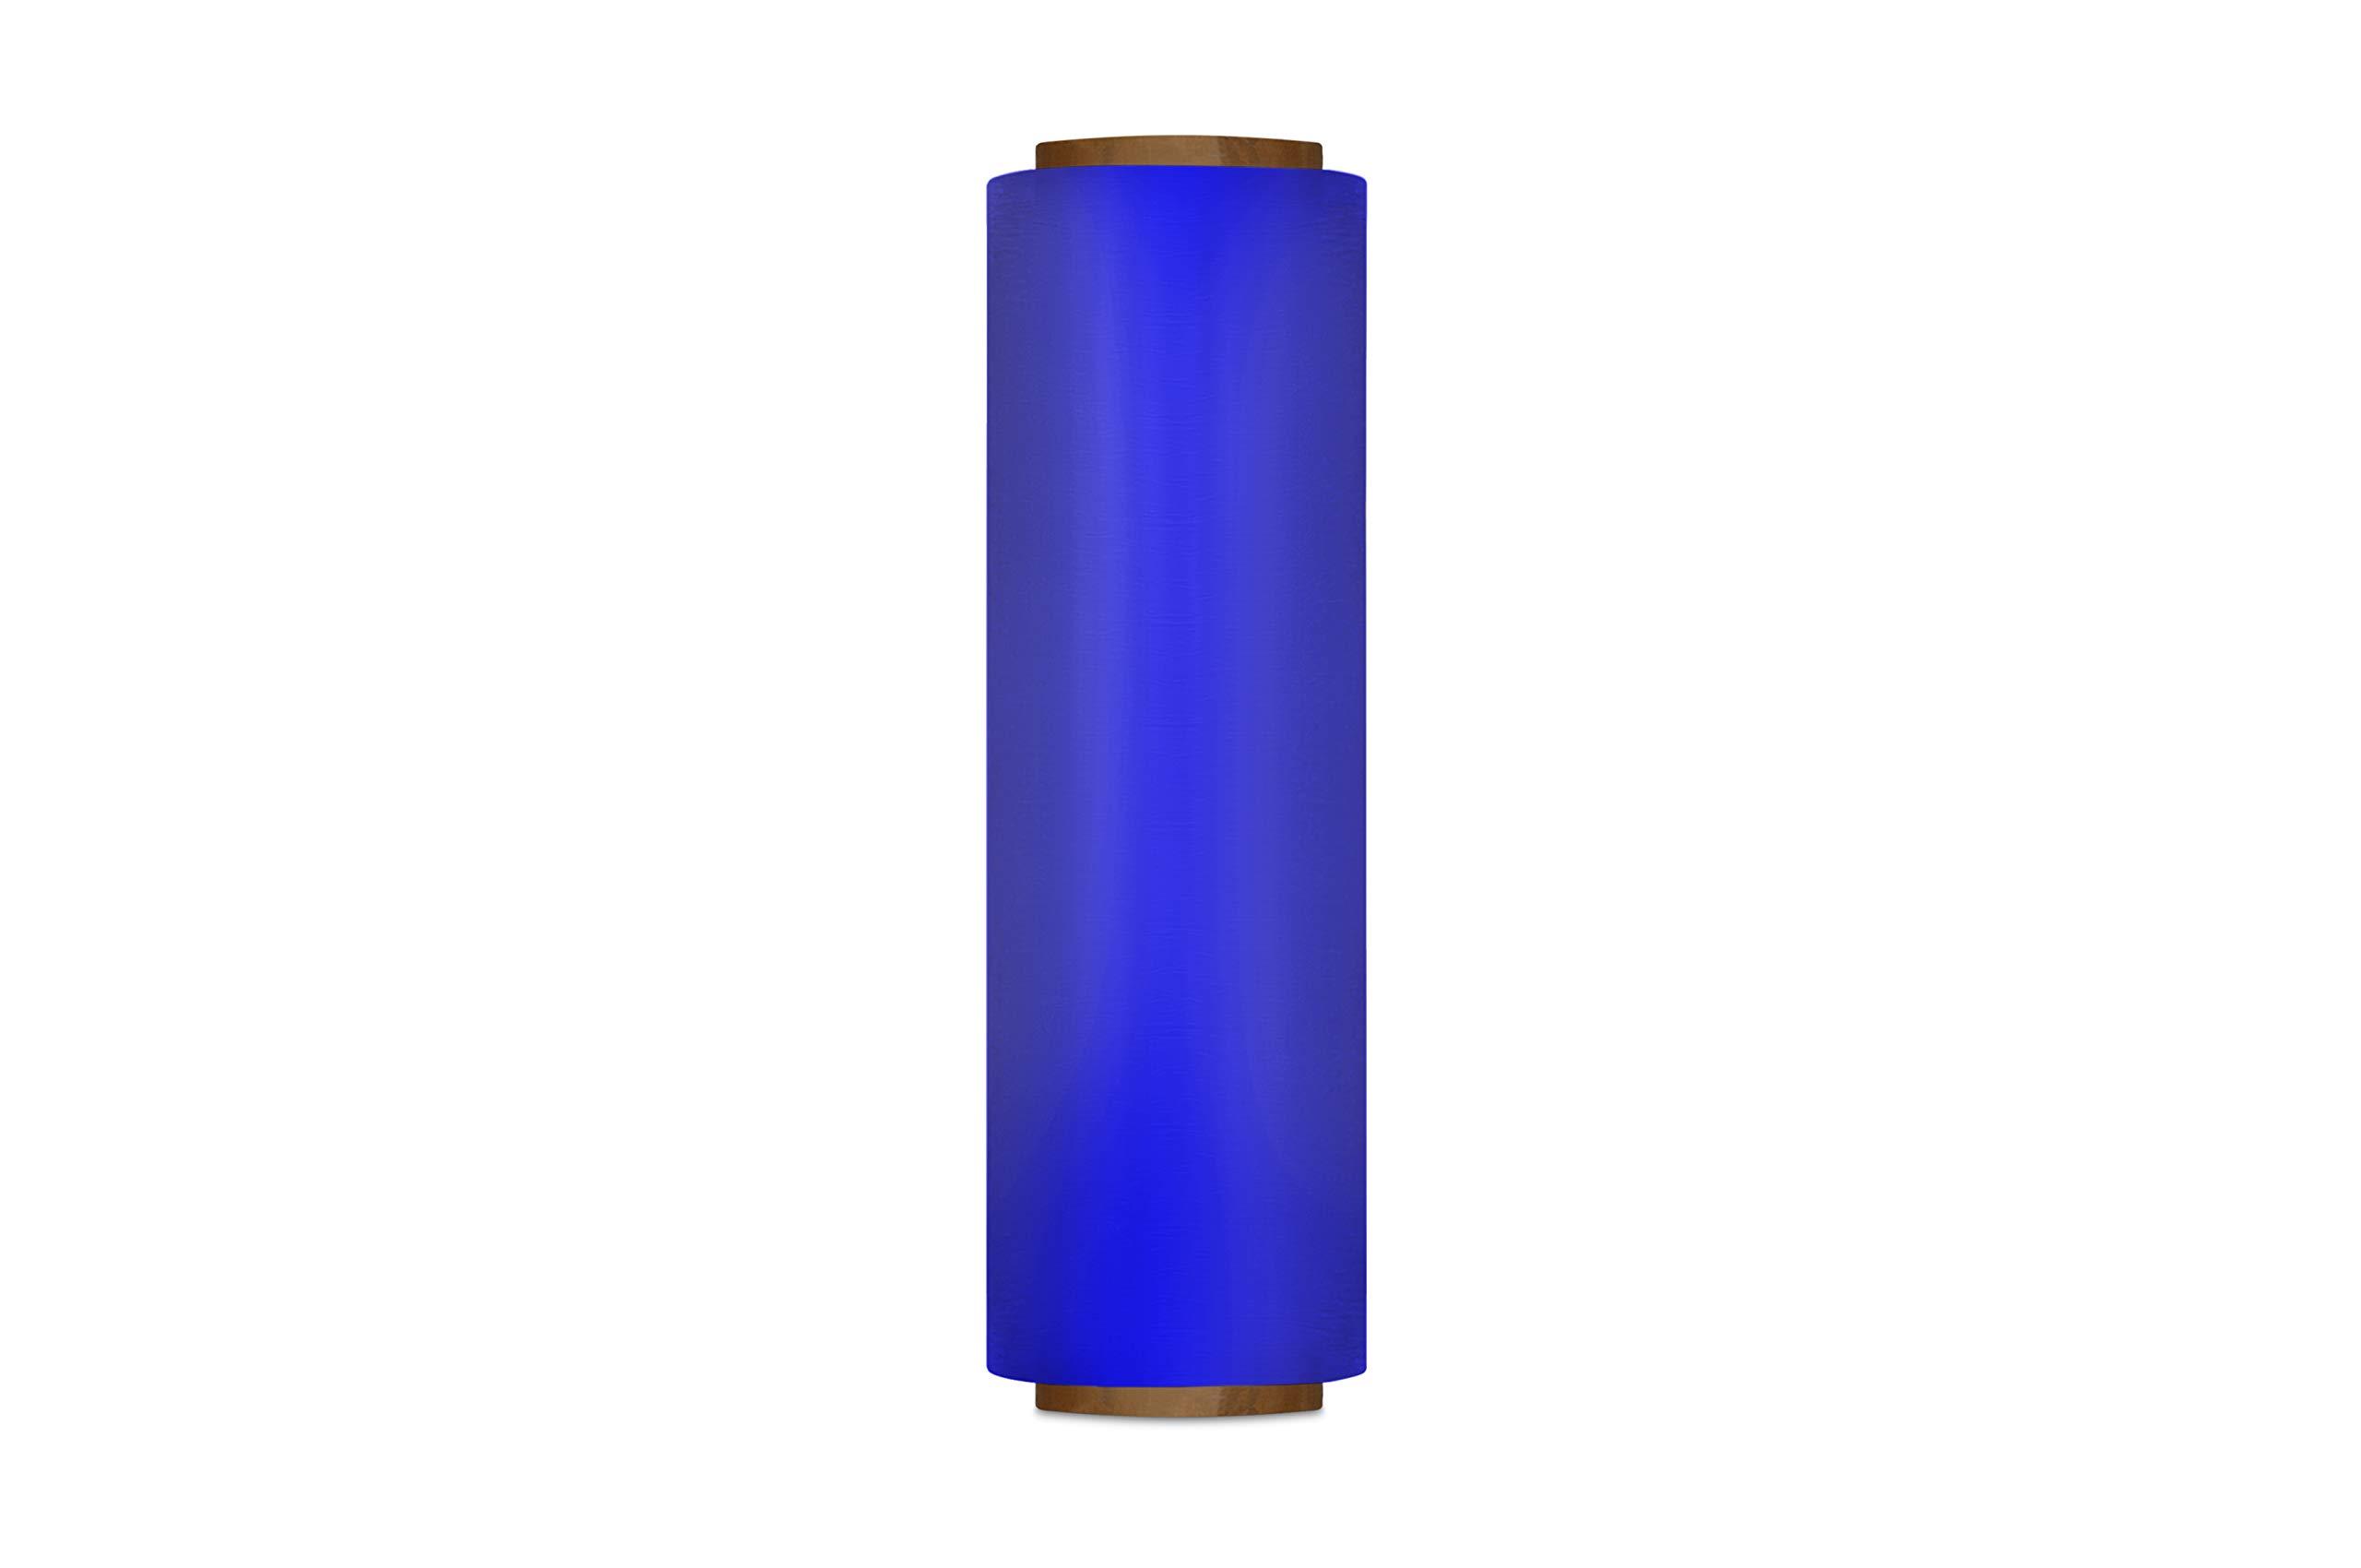 Stretch Wrap Film, Plastic Cling Wrap, Blue, 18 Inch x 1500 Feet, 80 Gauge, 1 Roll by PackagingSuppliesByMail